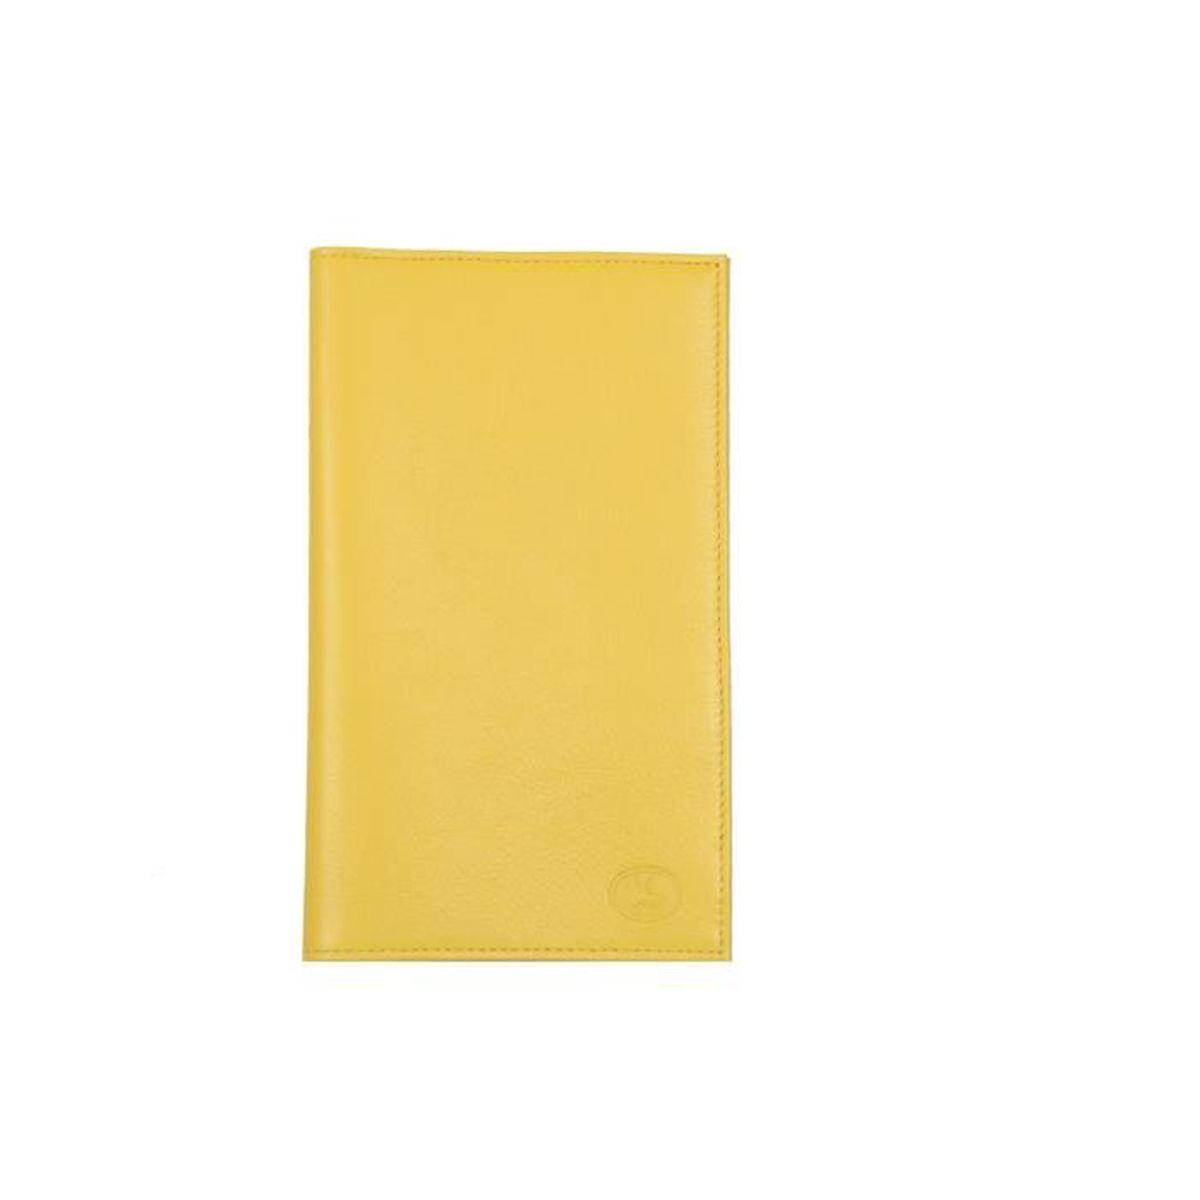 porte ch quier cuir jaune achat vente porte ch quier 3664050435563 cdiscount. Black Bedroom Furniture Sets. Home Design Ideas